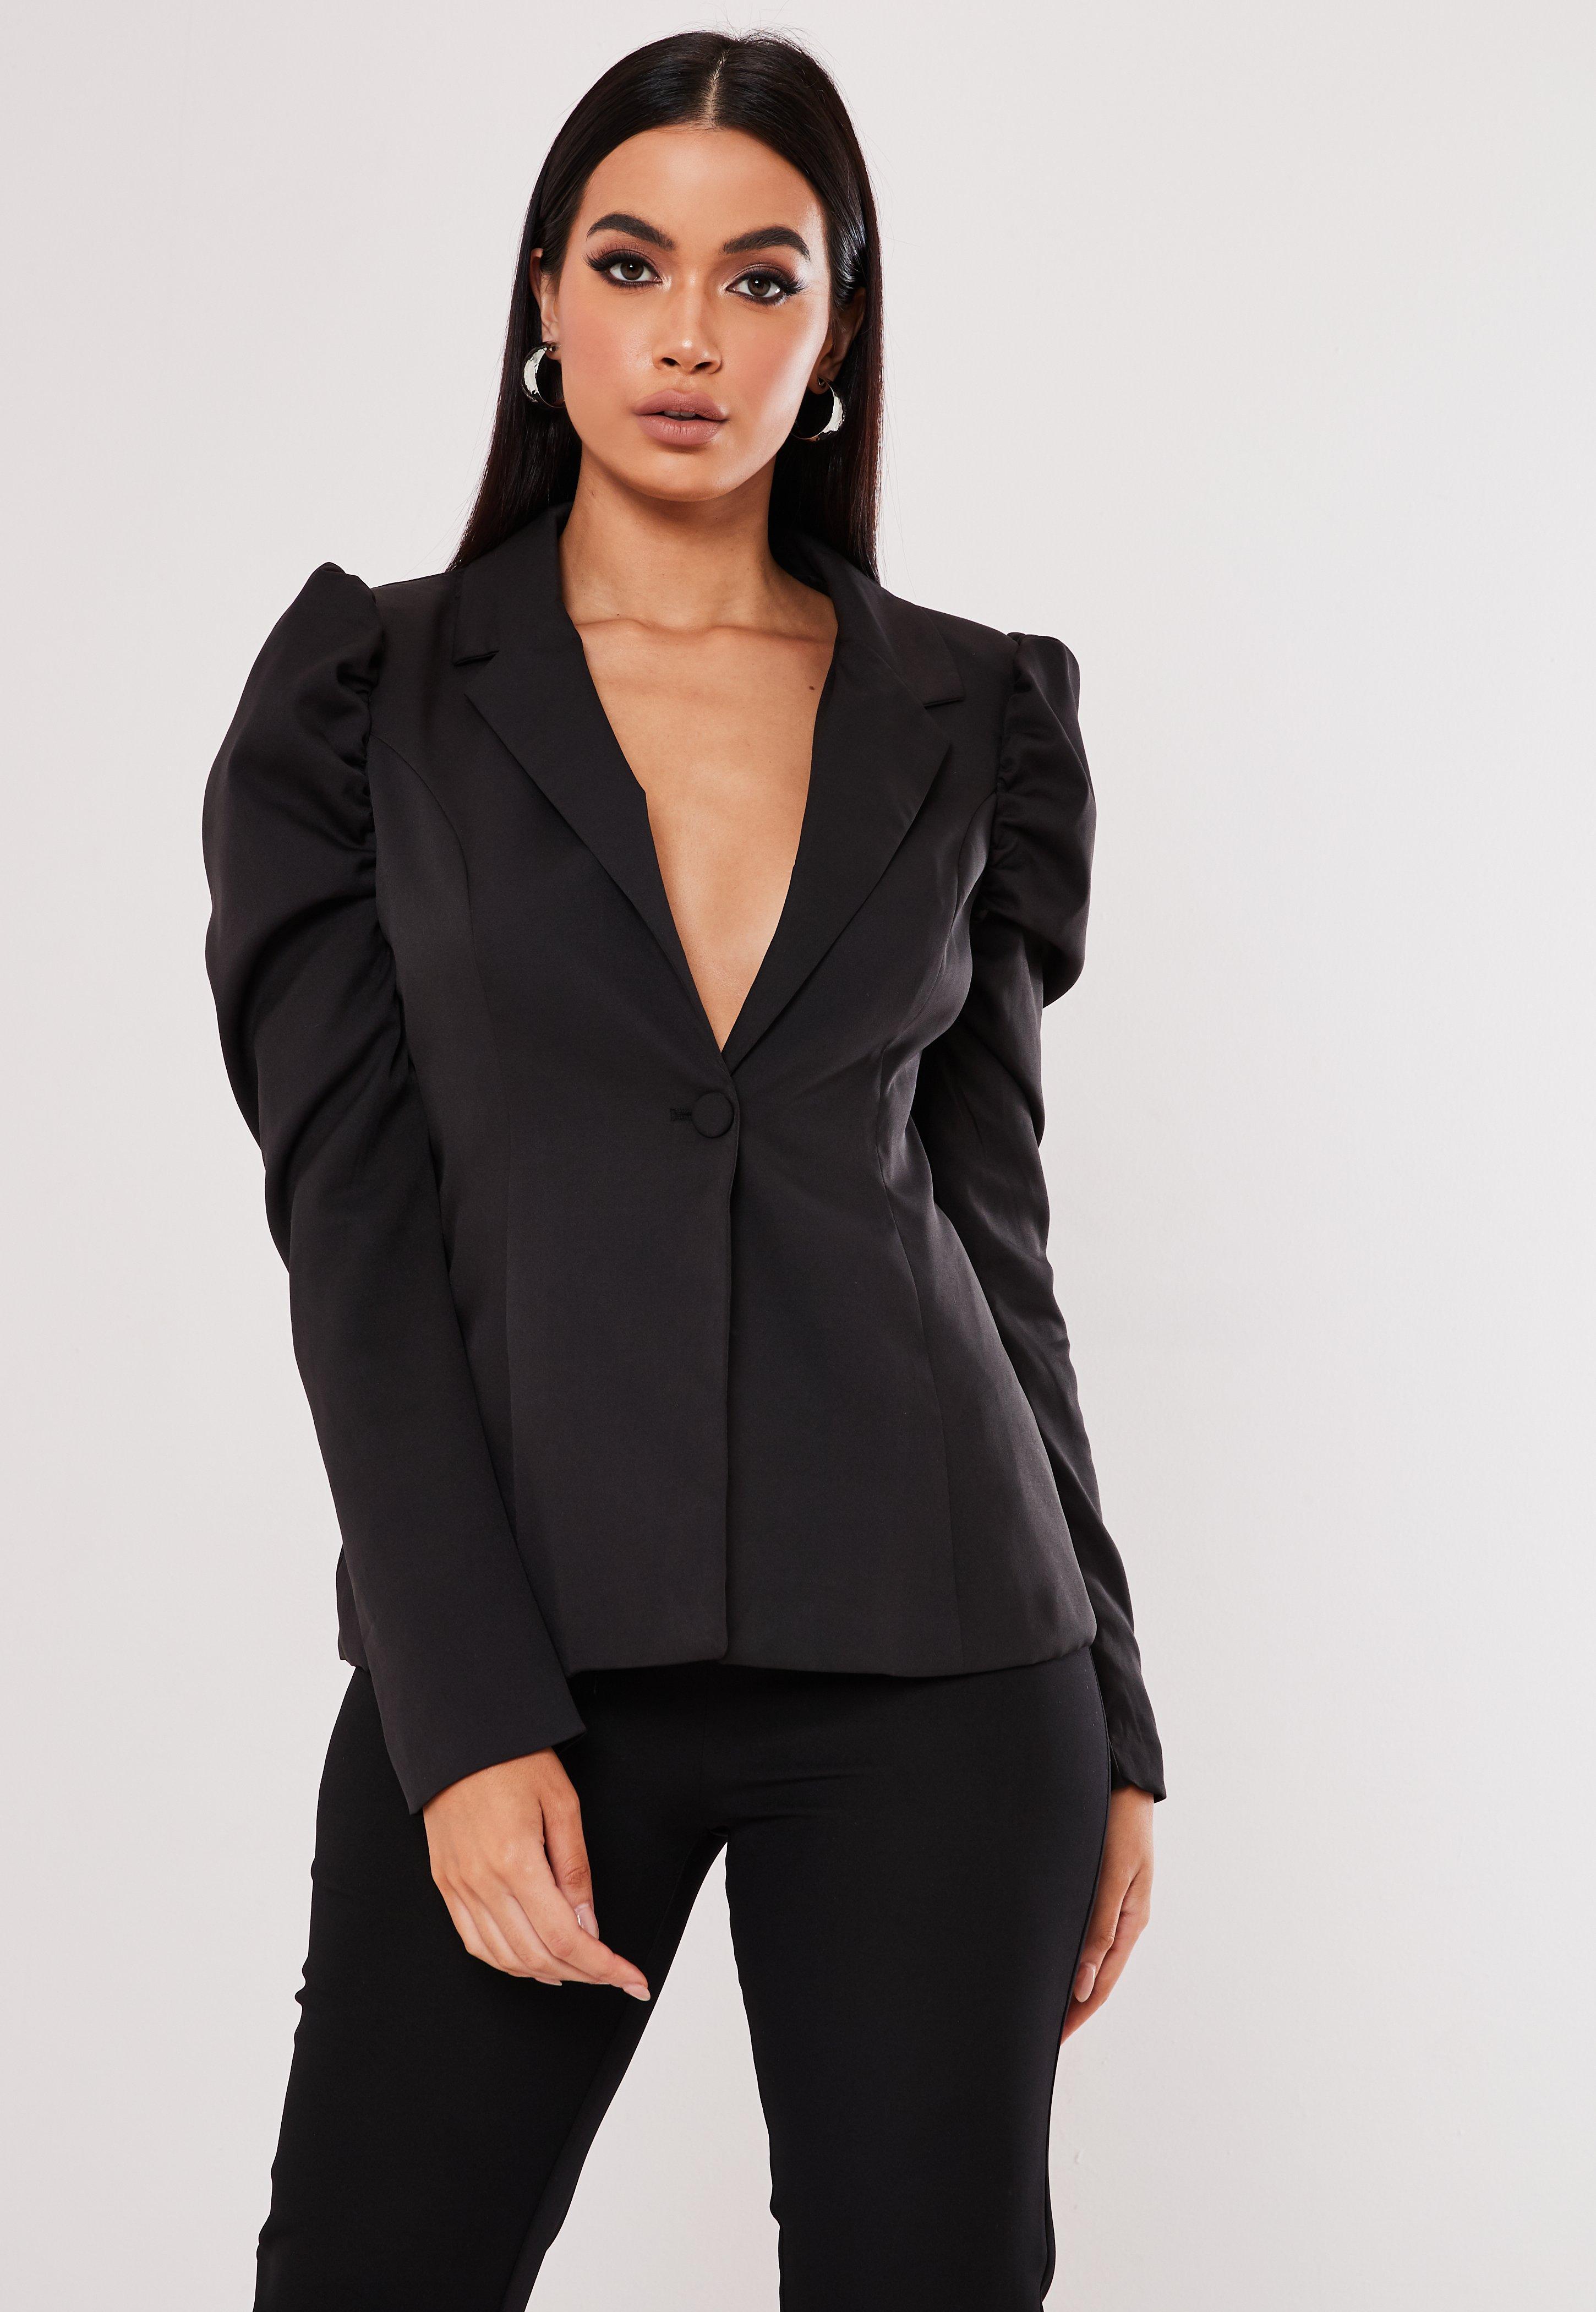 NEW Women Blazer 16 18 20 Nude Brown Black Jacket POCKET 3//4 Ruched Sleeve Top